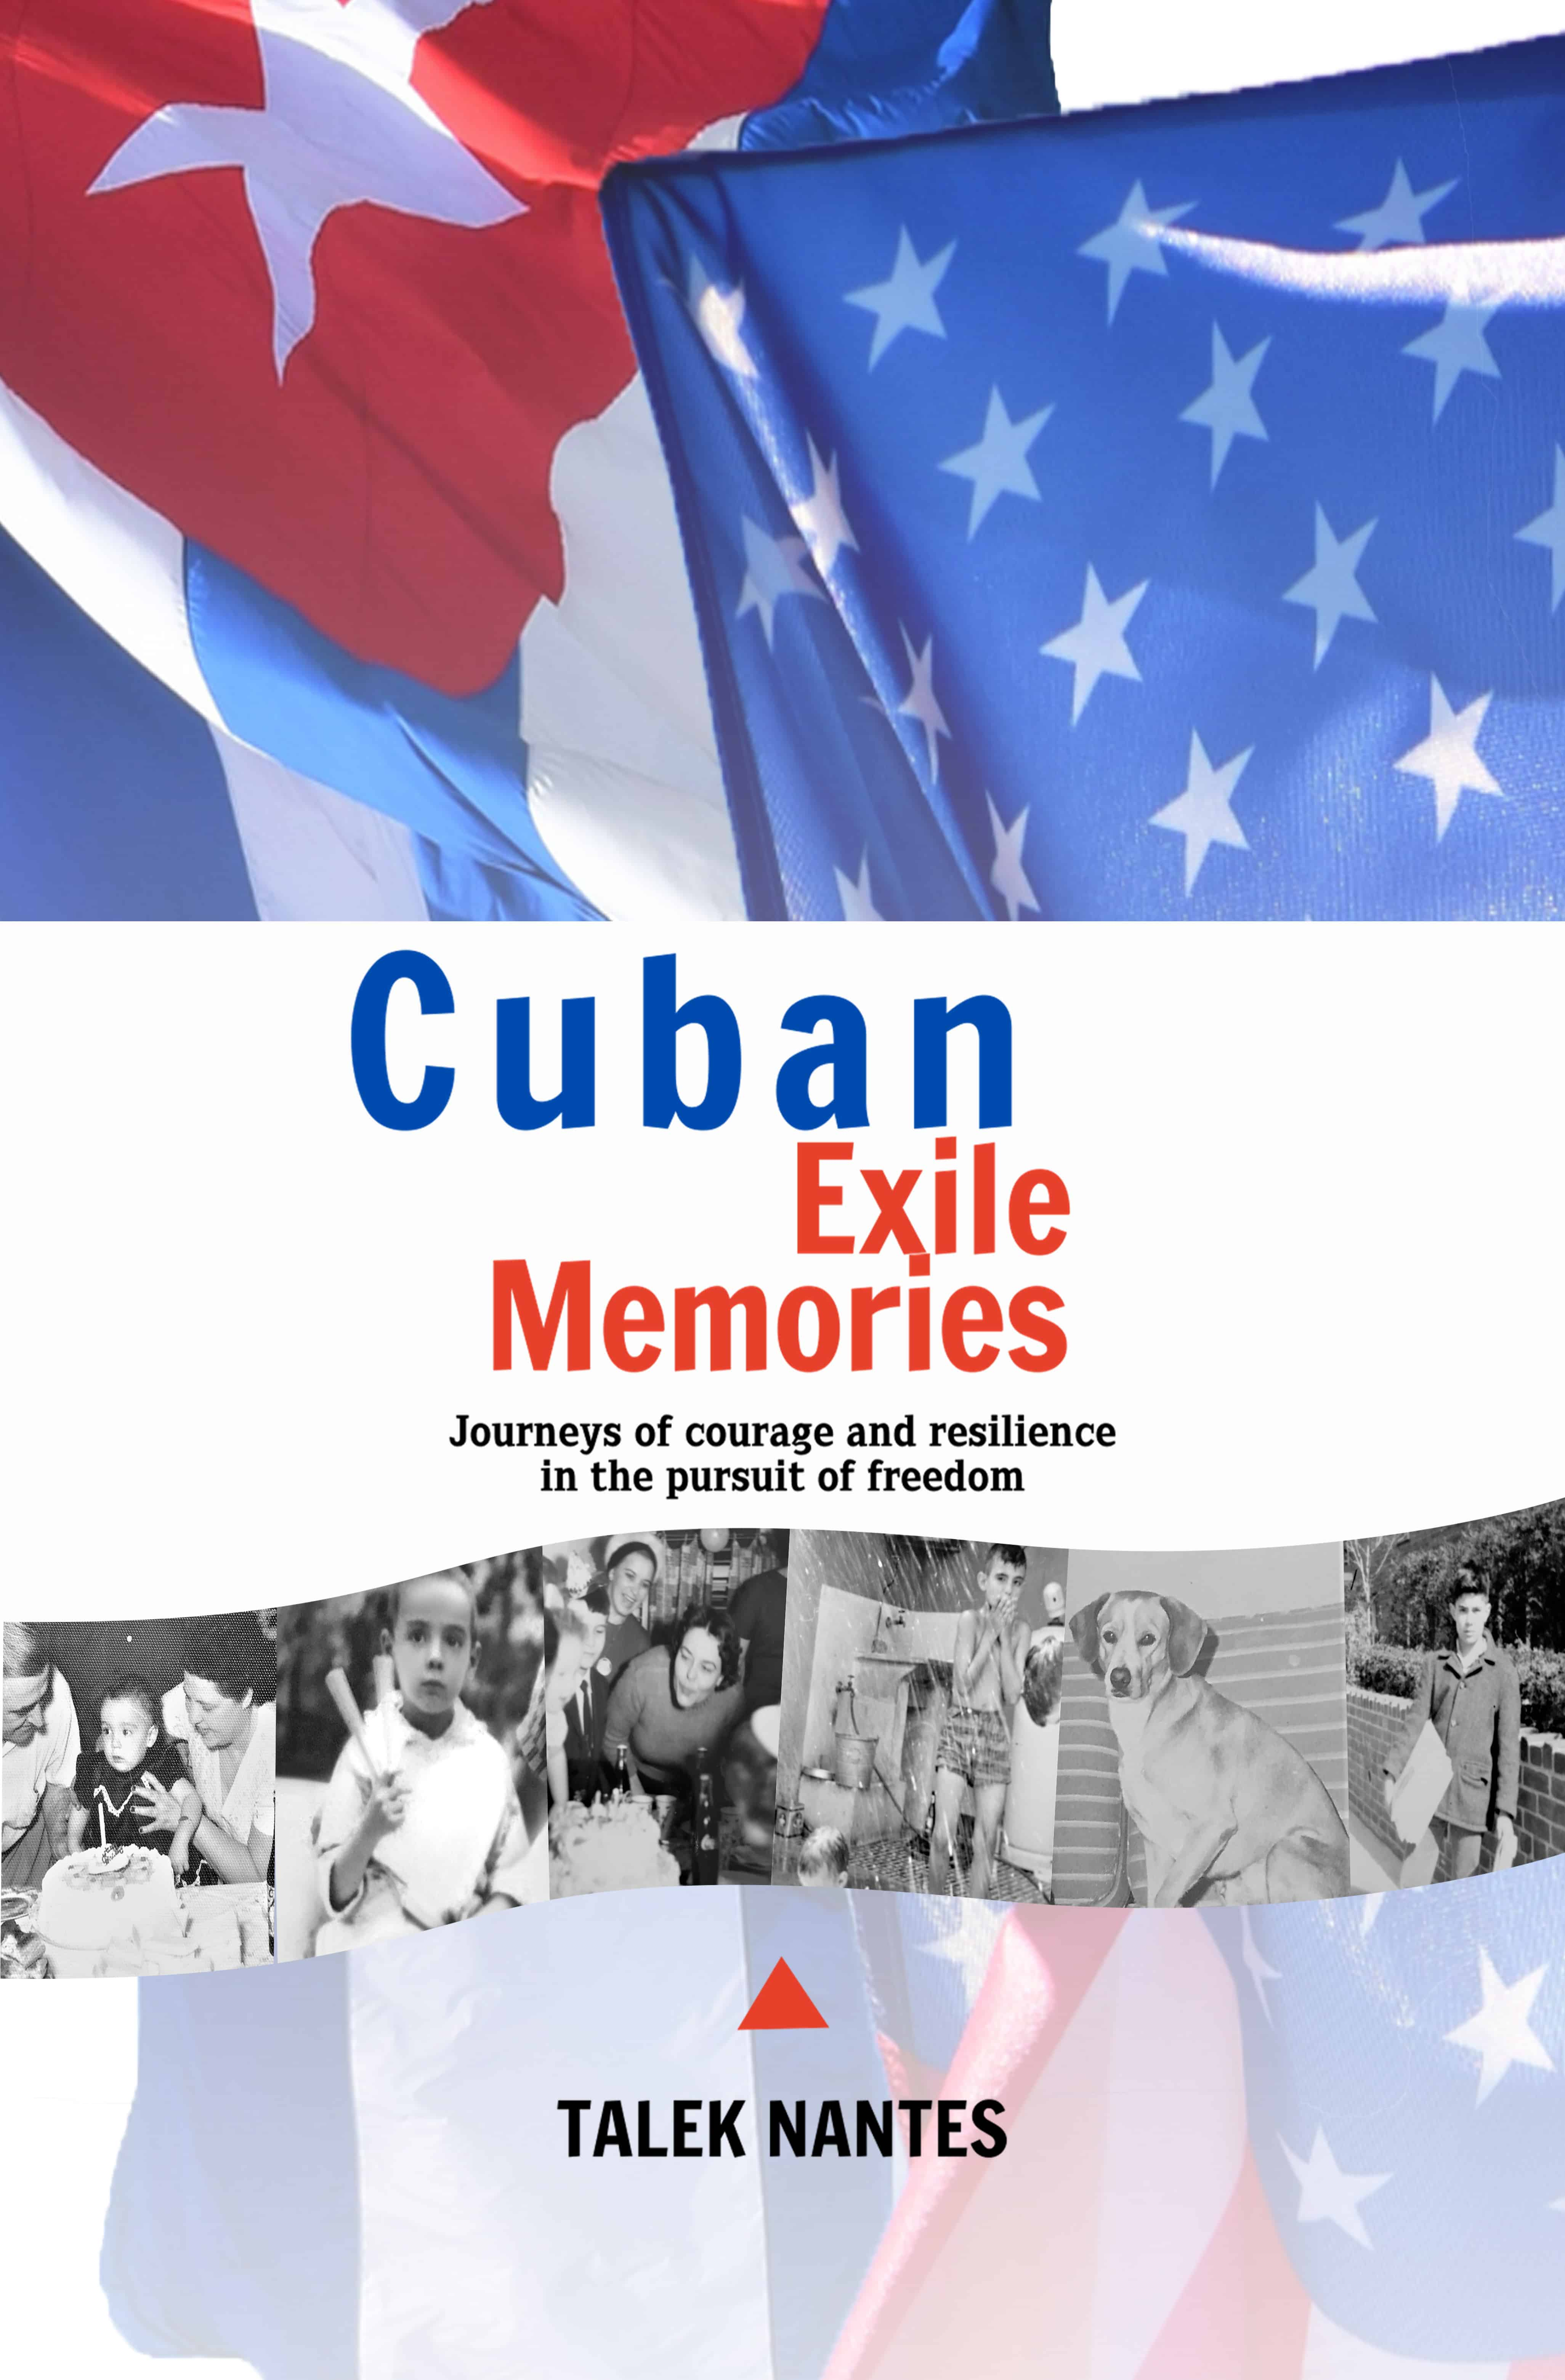 Cuban Exile Memories book cover